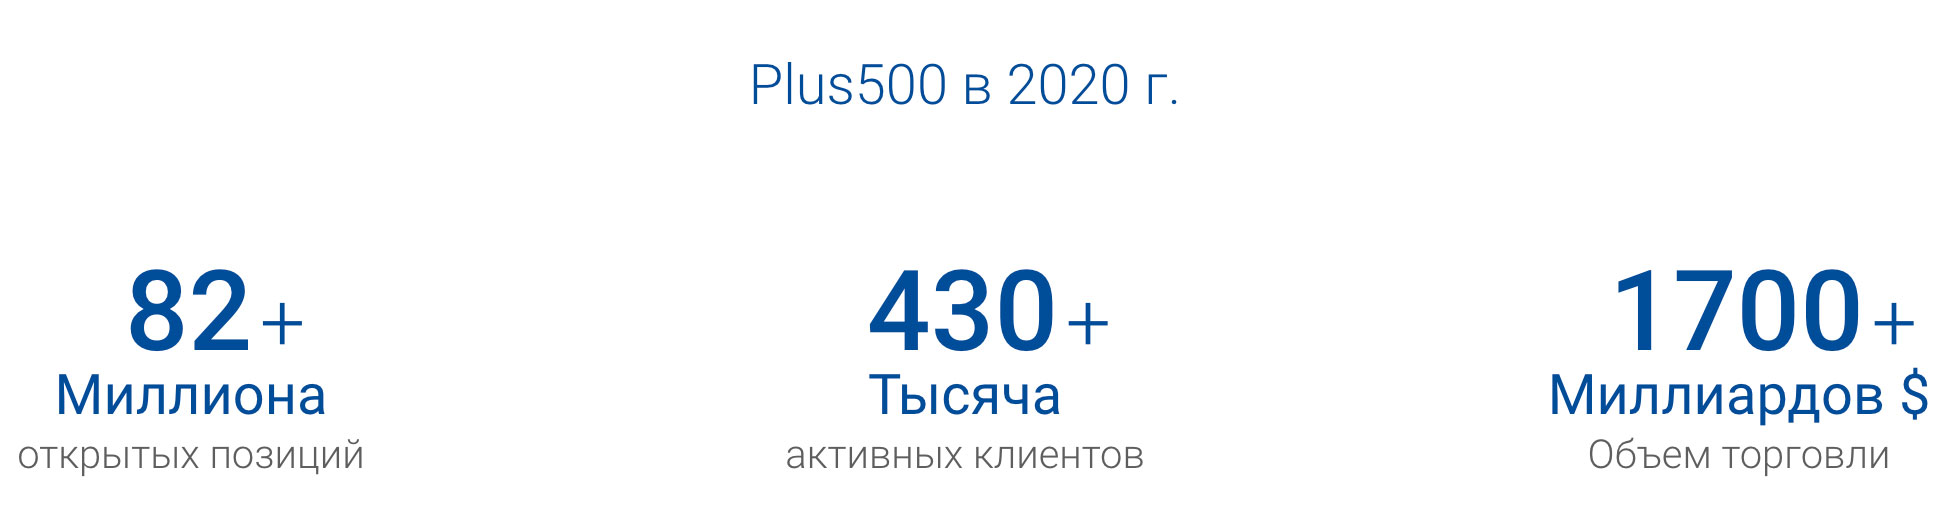 plus500 статистика